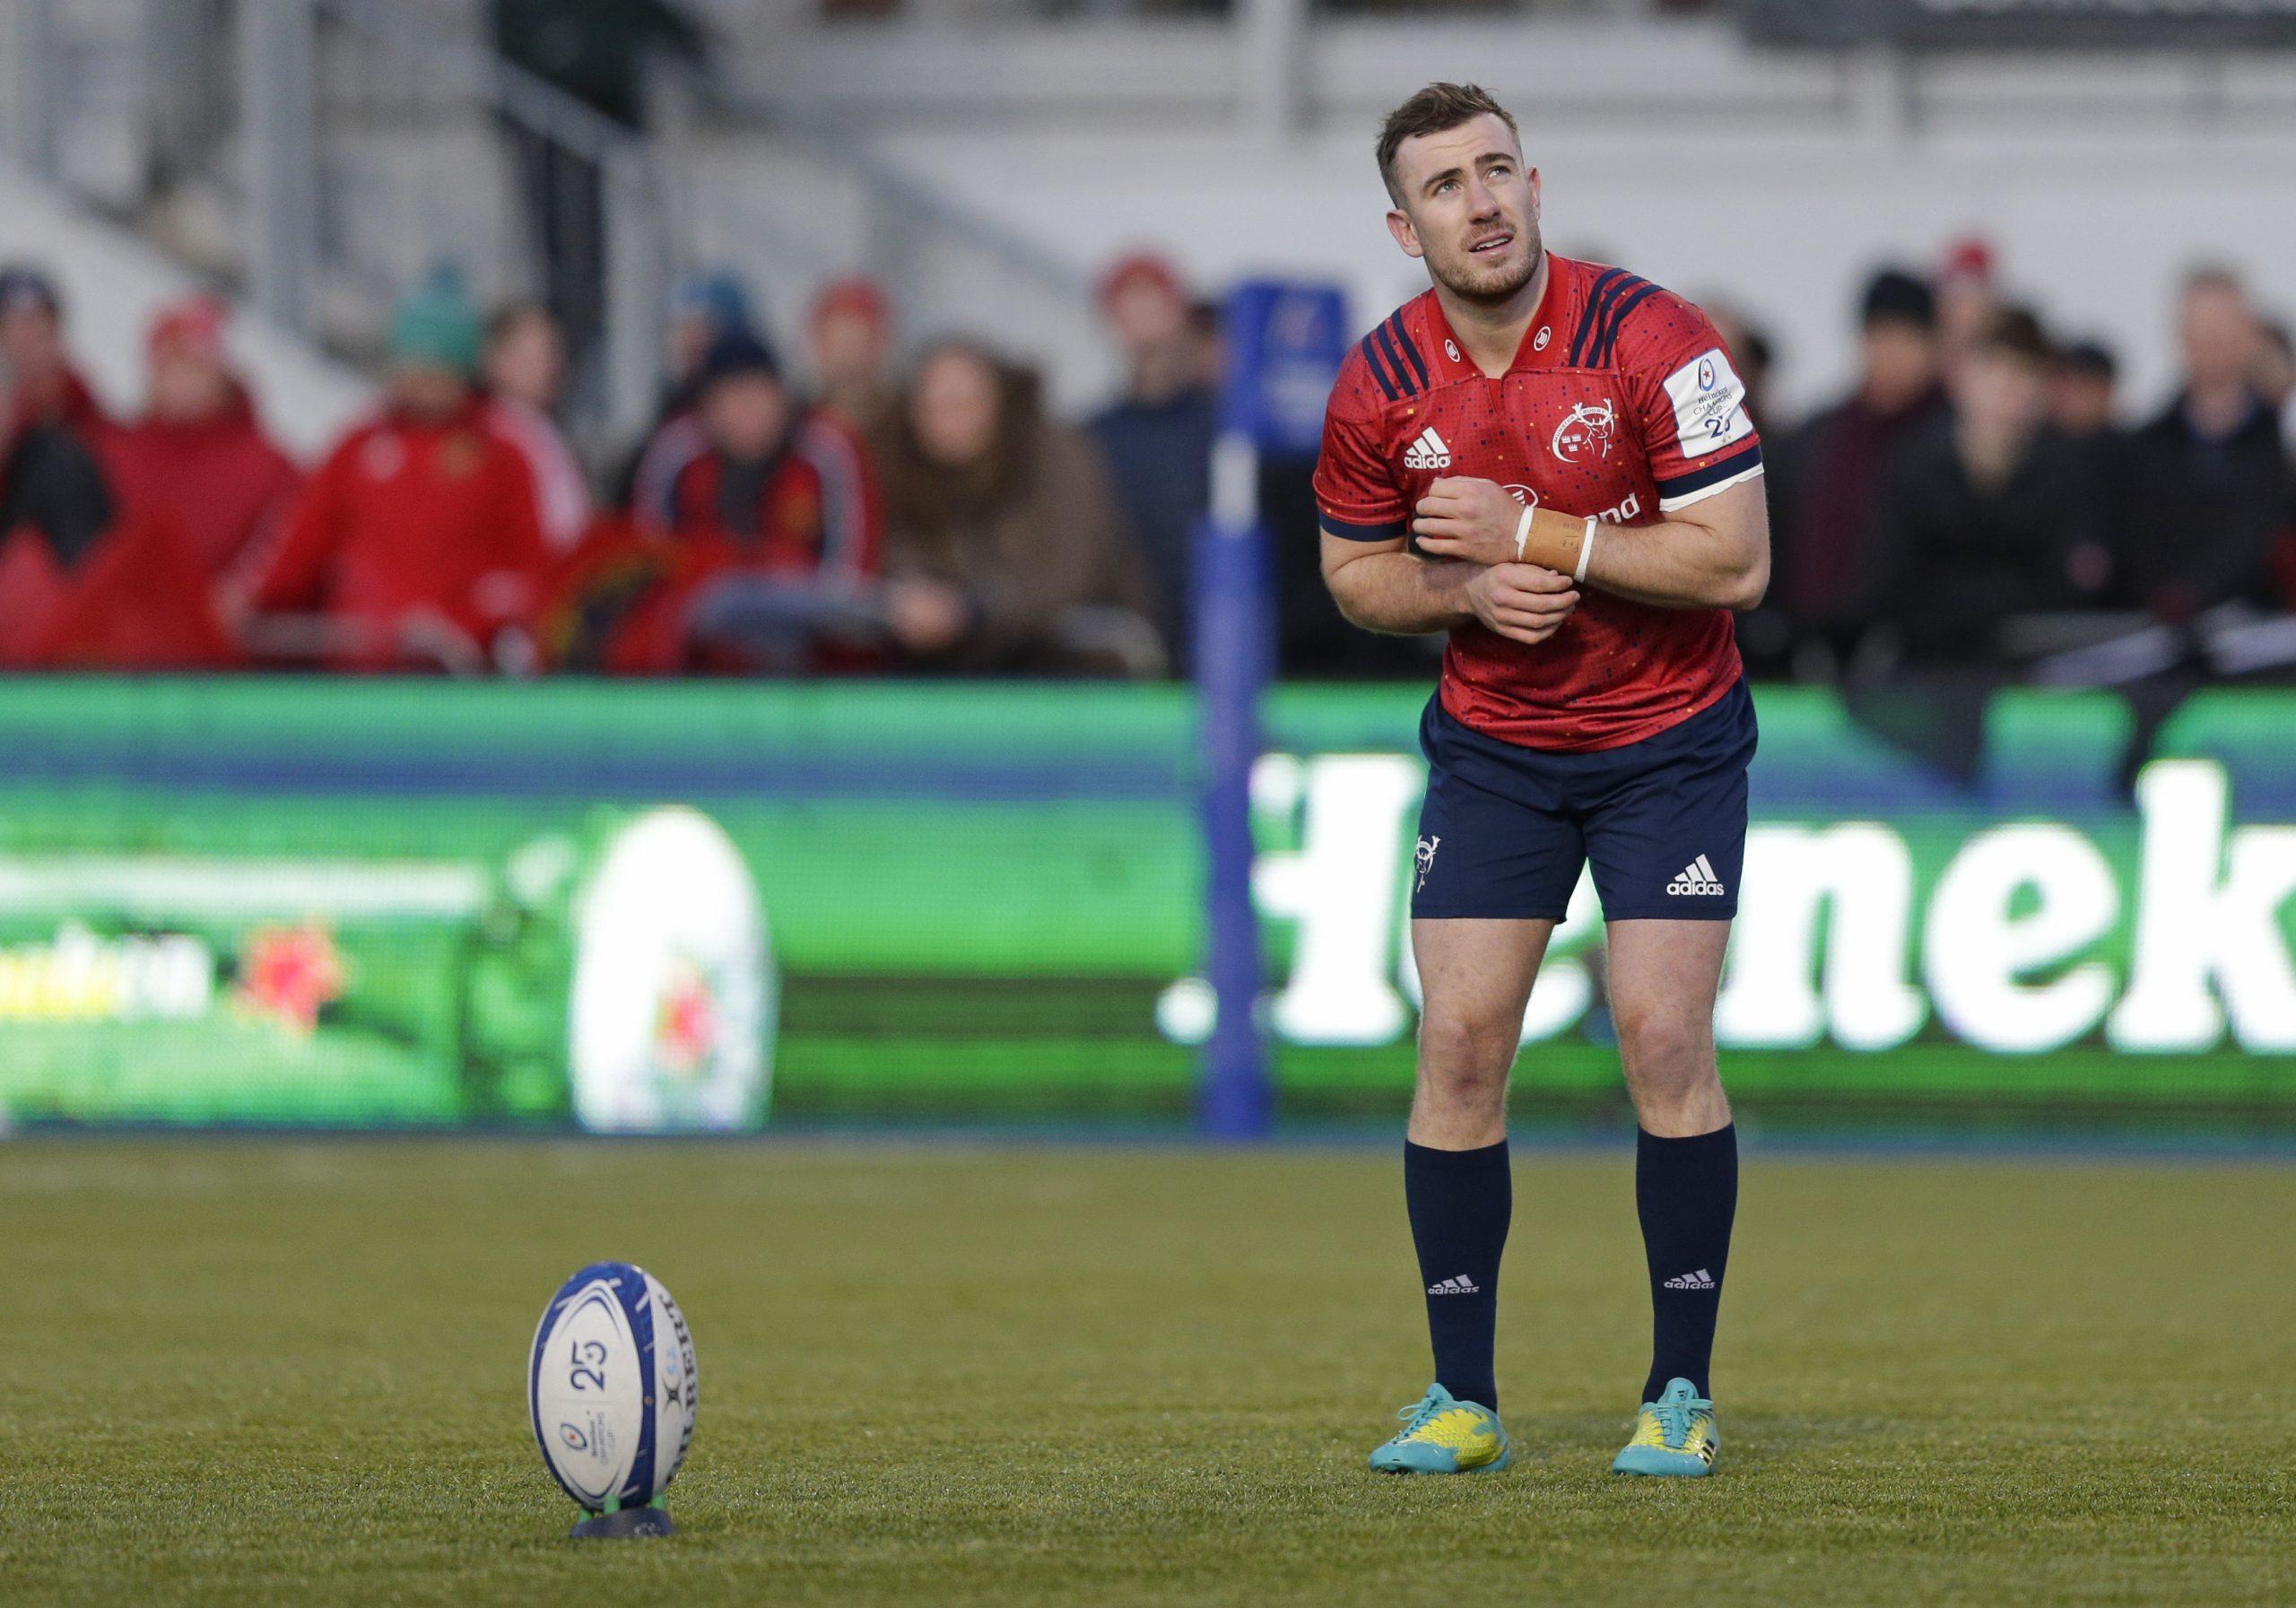 Irish players kick their way to top of points-scoring chart